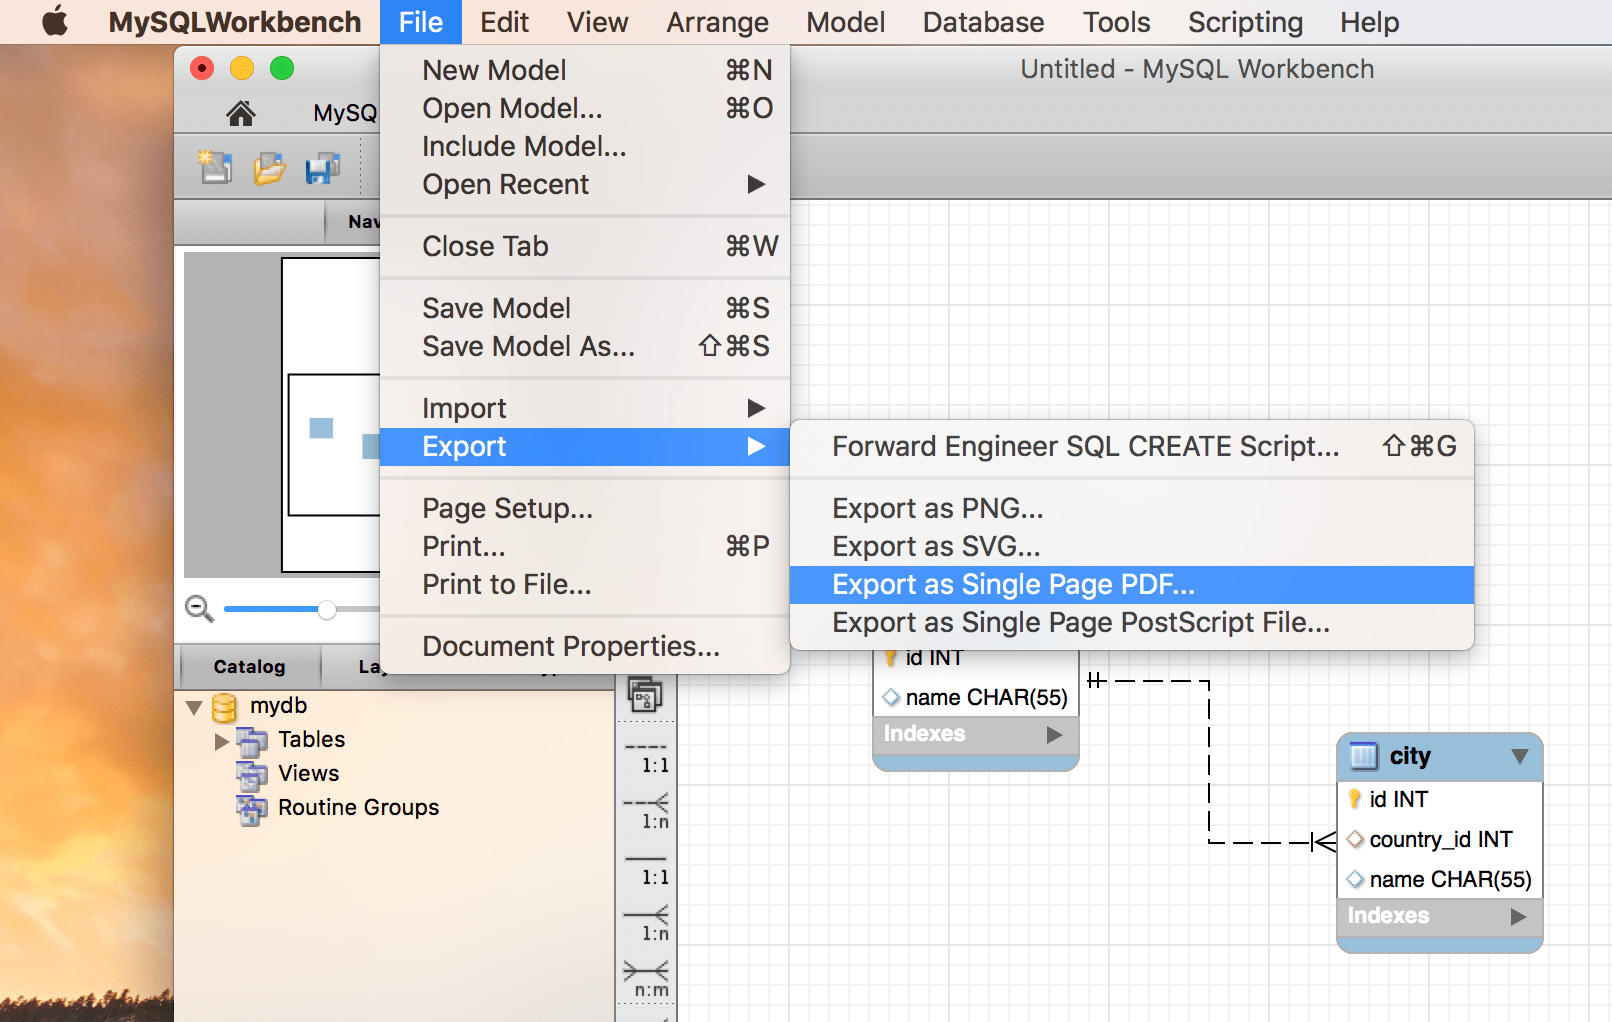 how to generate database eer diagrams from sql scripts using mysql MySQL Schema mysql workbench eer diagrams export as pdf